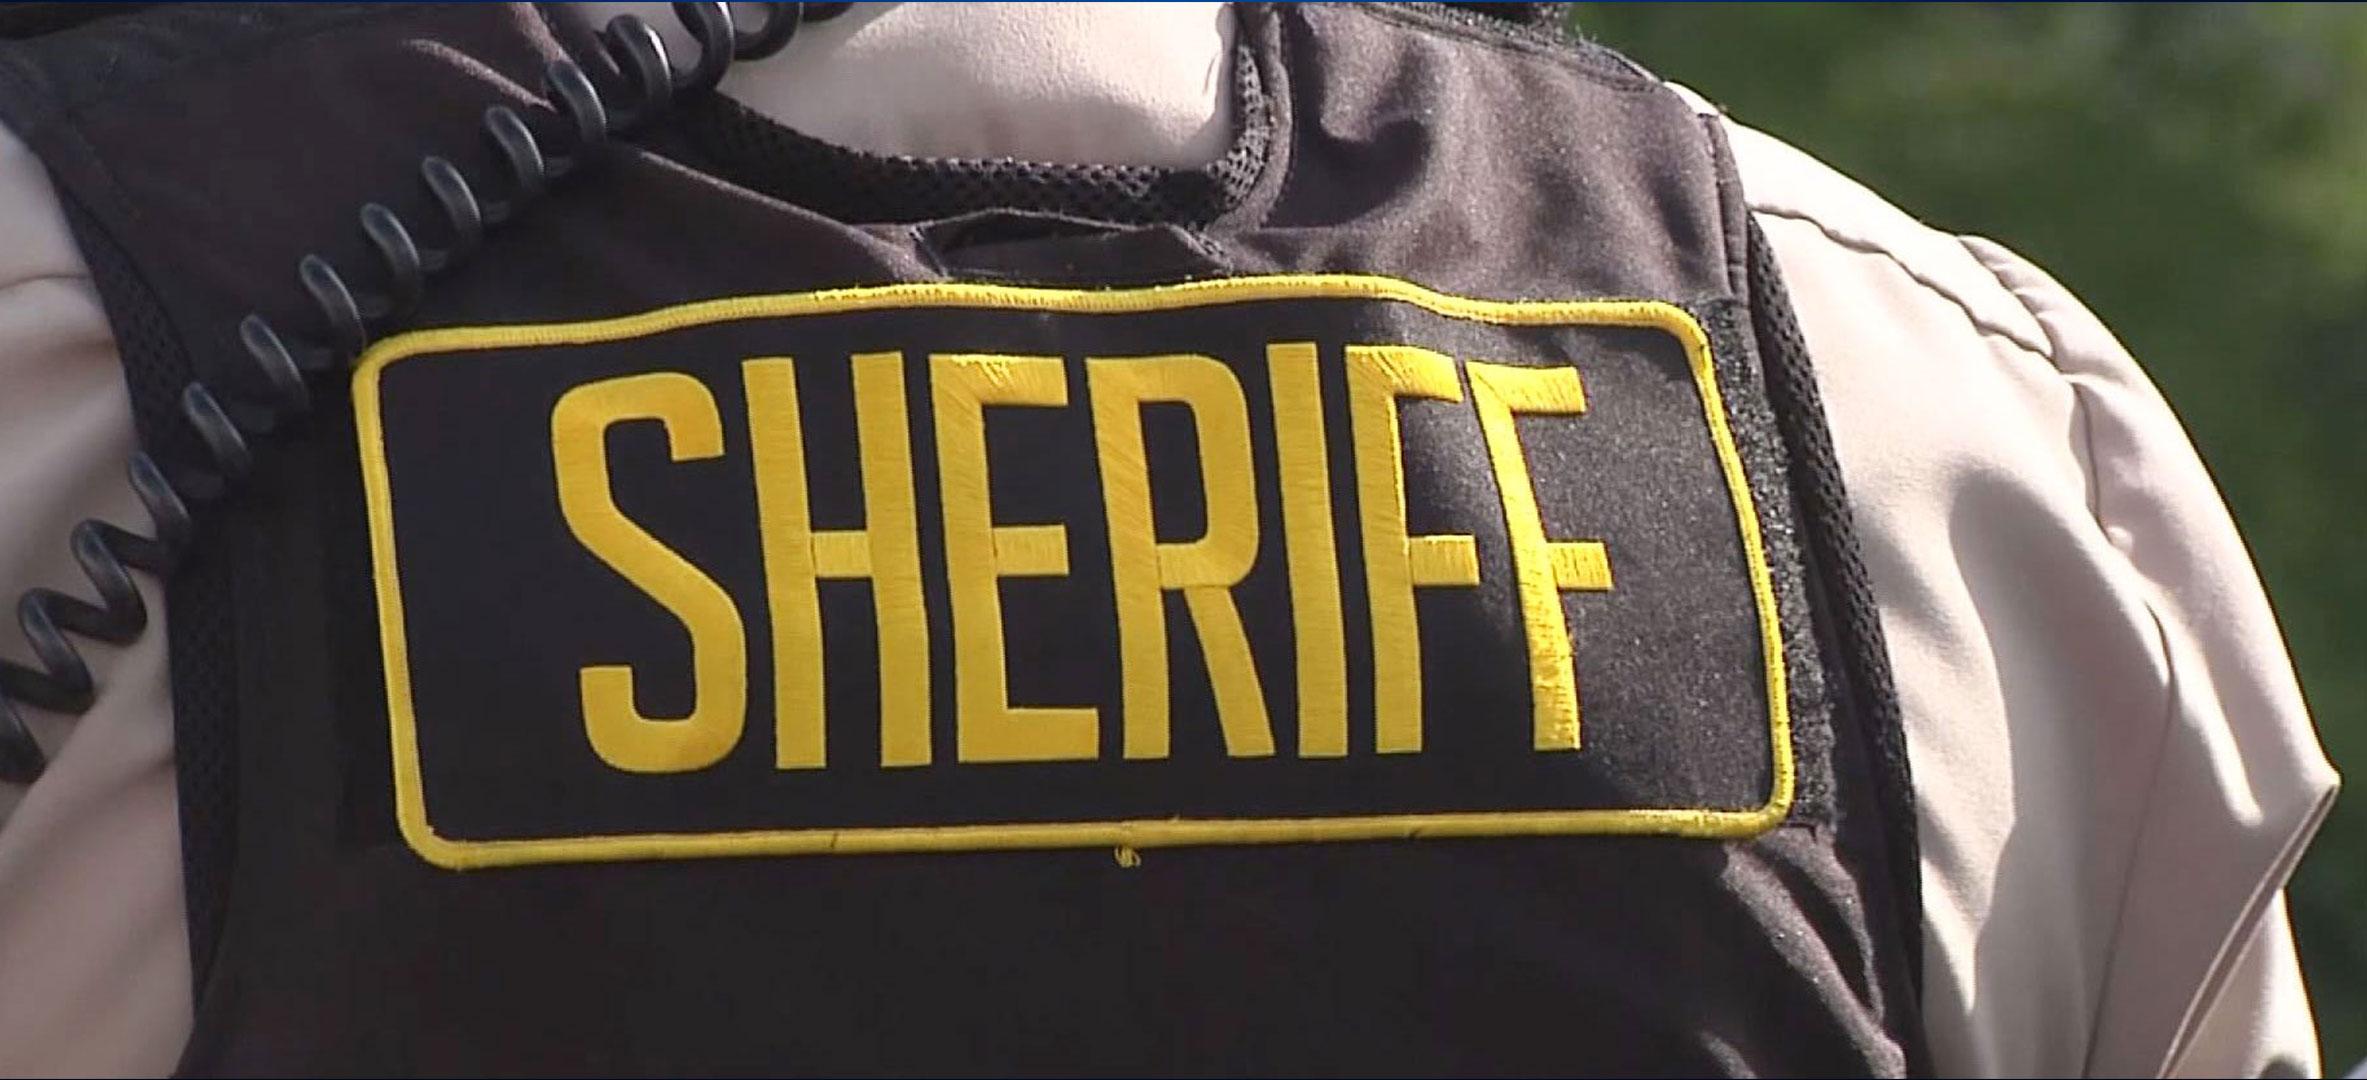 KELO Sheriff General.jpg